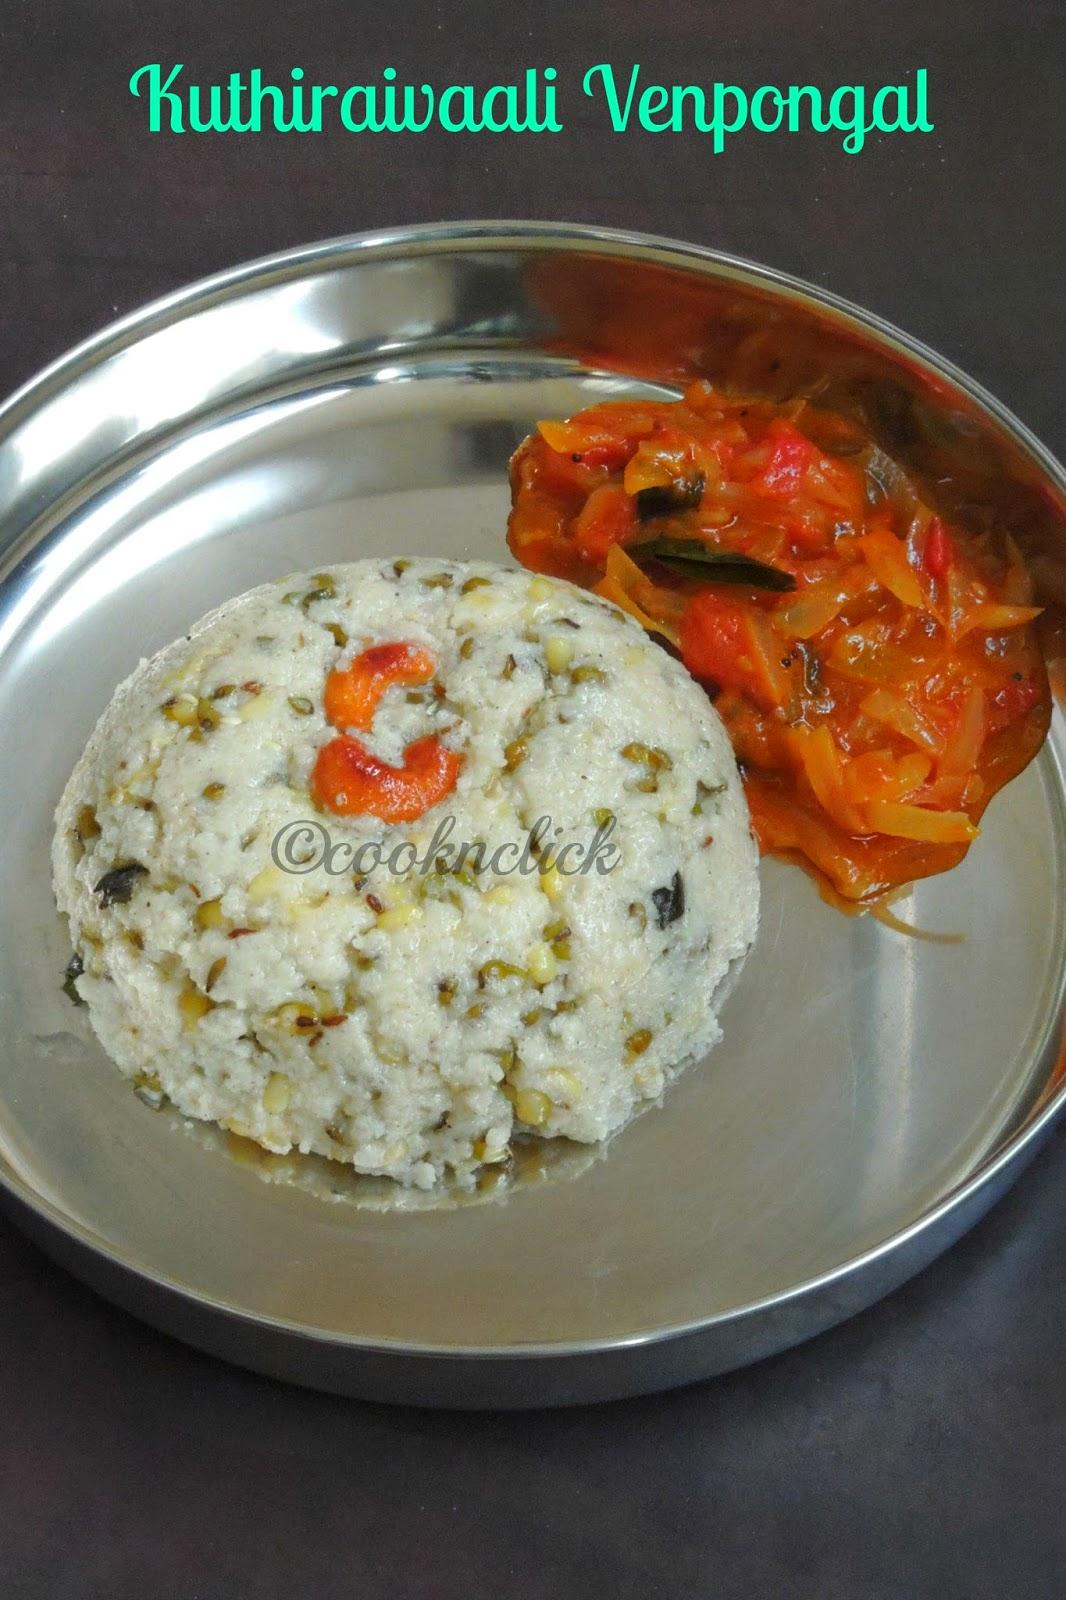 Kuthiraivalli venpongal, Kuthiravaali Mulaikattina Payaru Pongal, Baryard Millet & sprouted green gram pongal